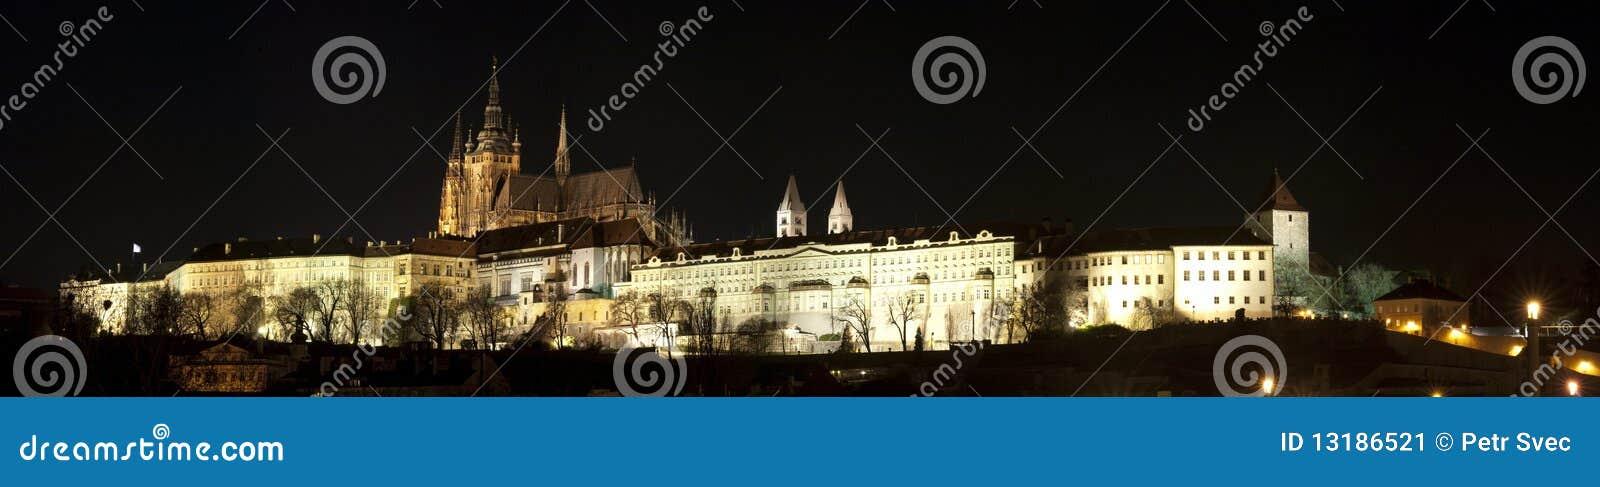 Panorama del castillo de Praga